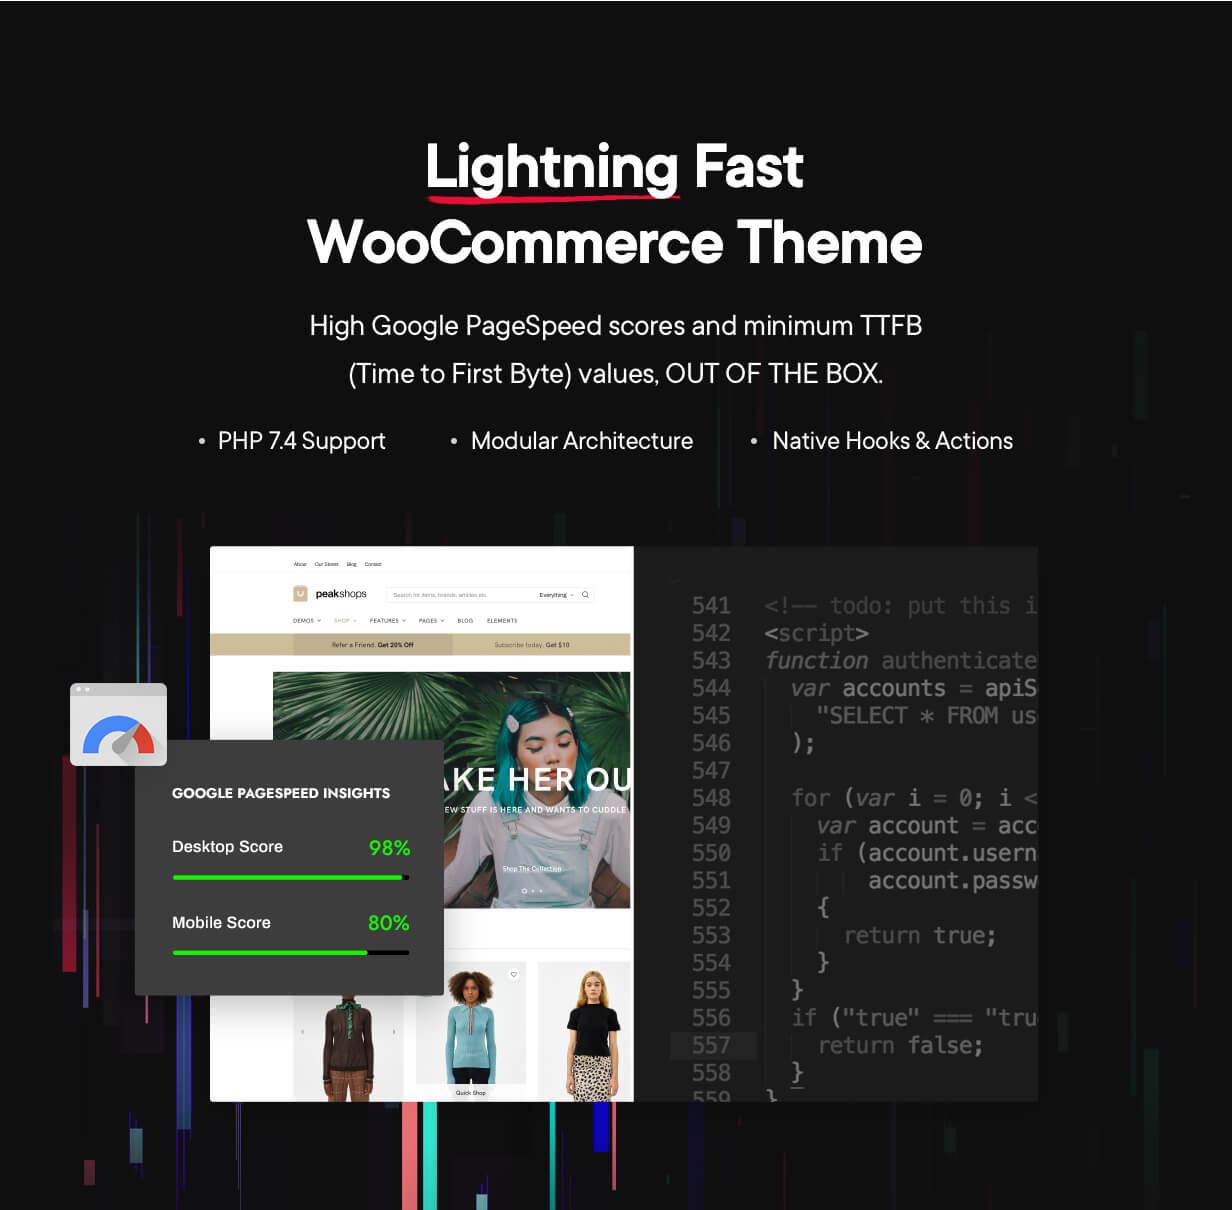 PeakShops v1.3.6.1-现代和多概念WooCommerce主题插图8